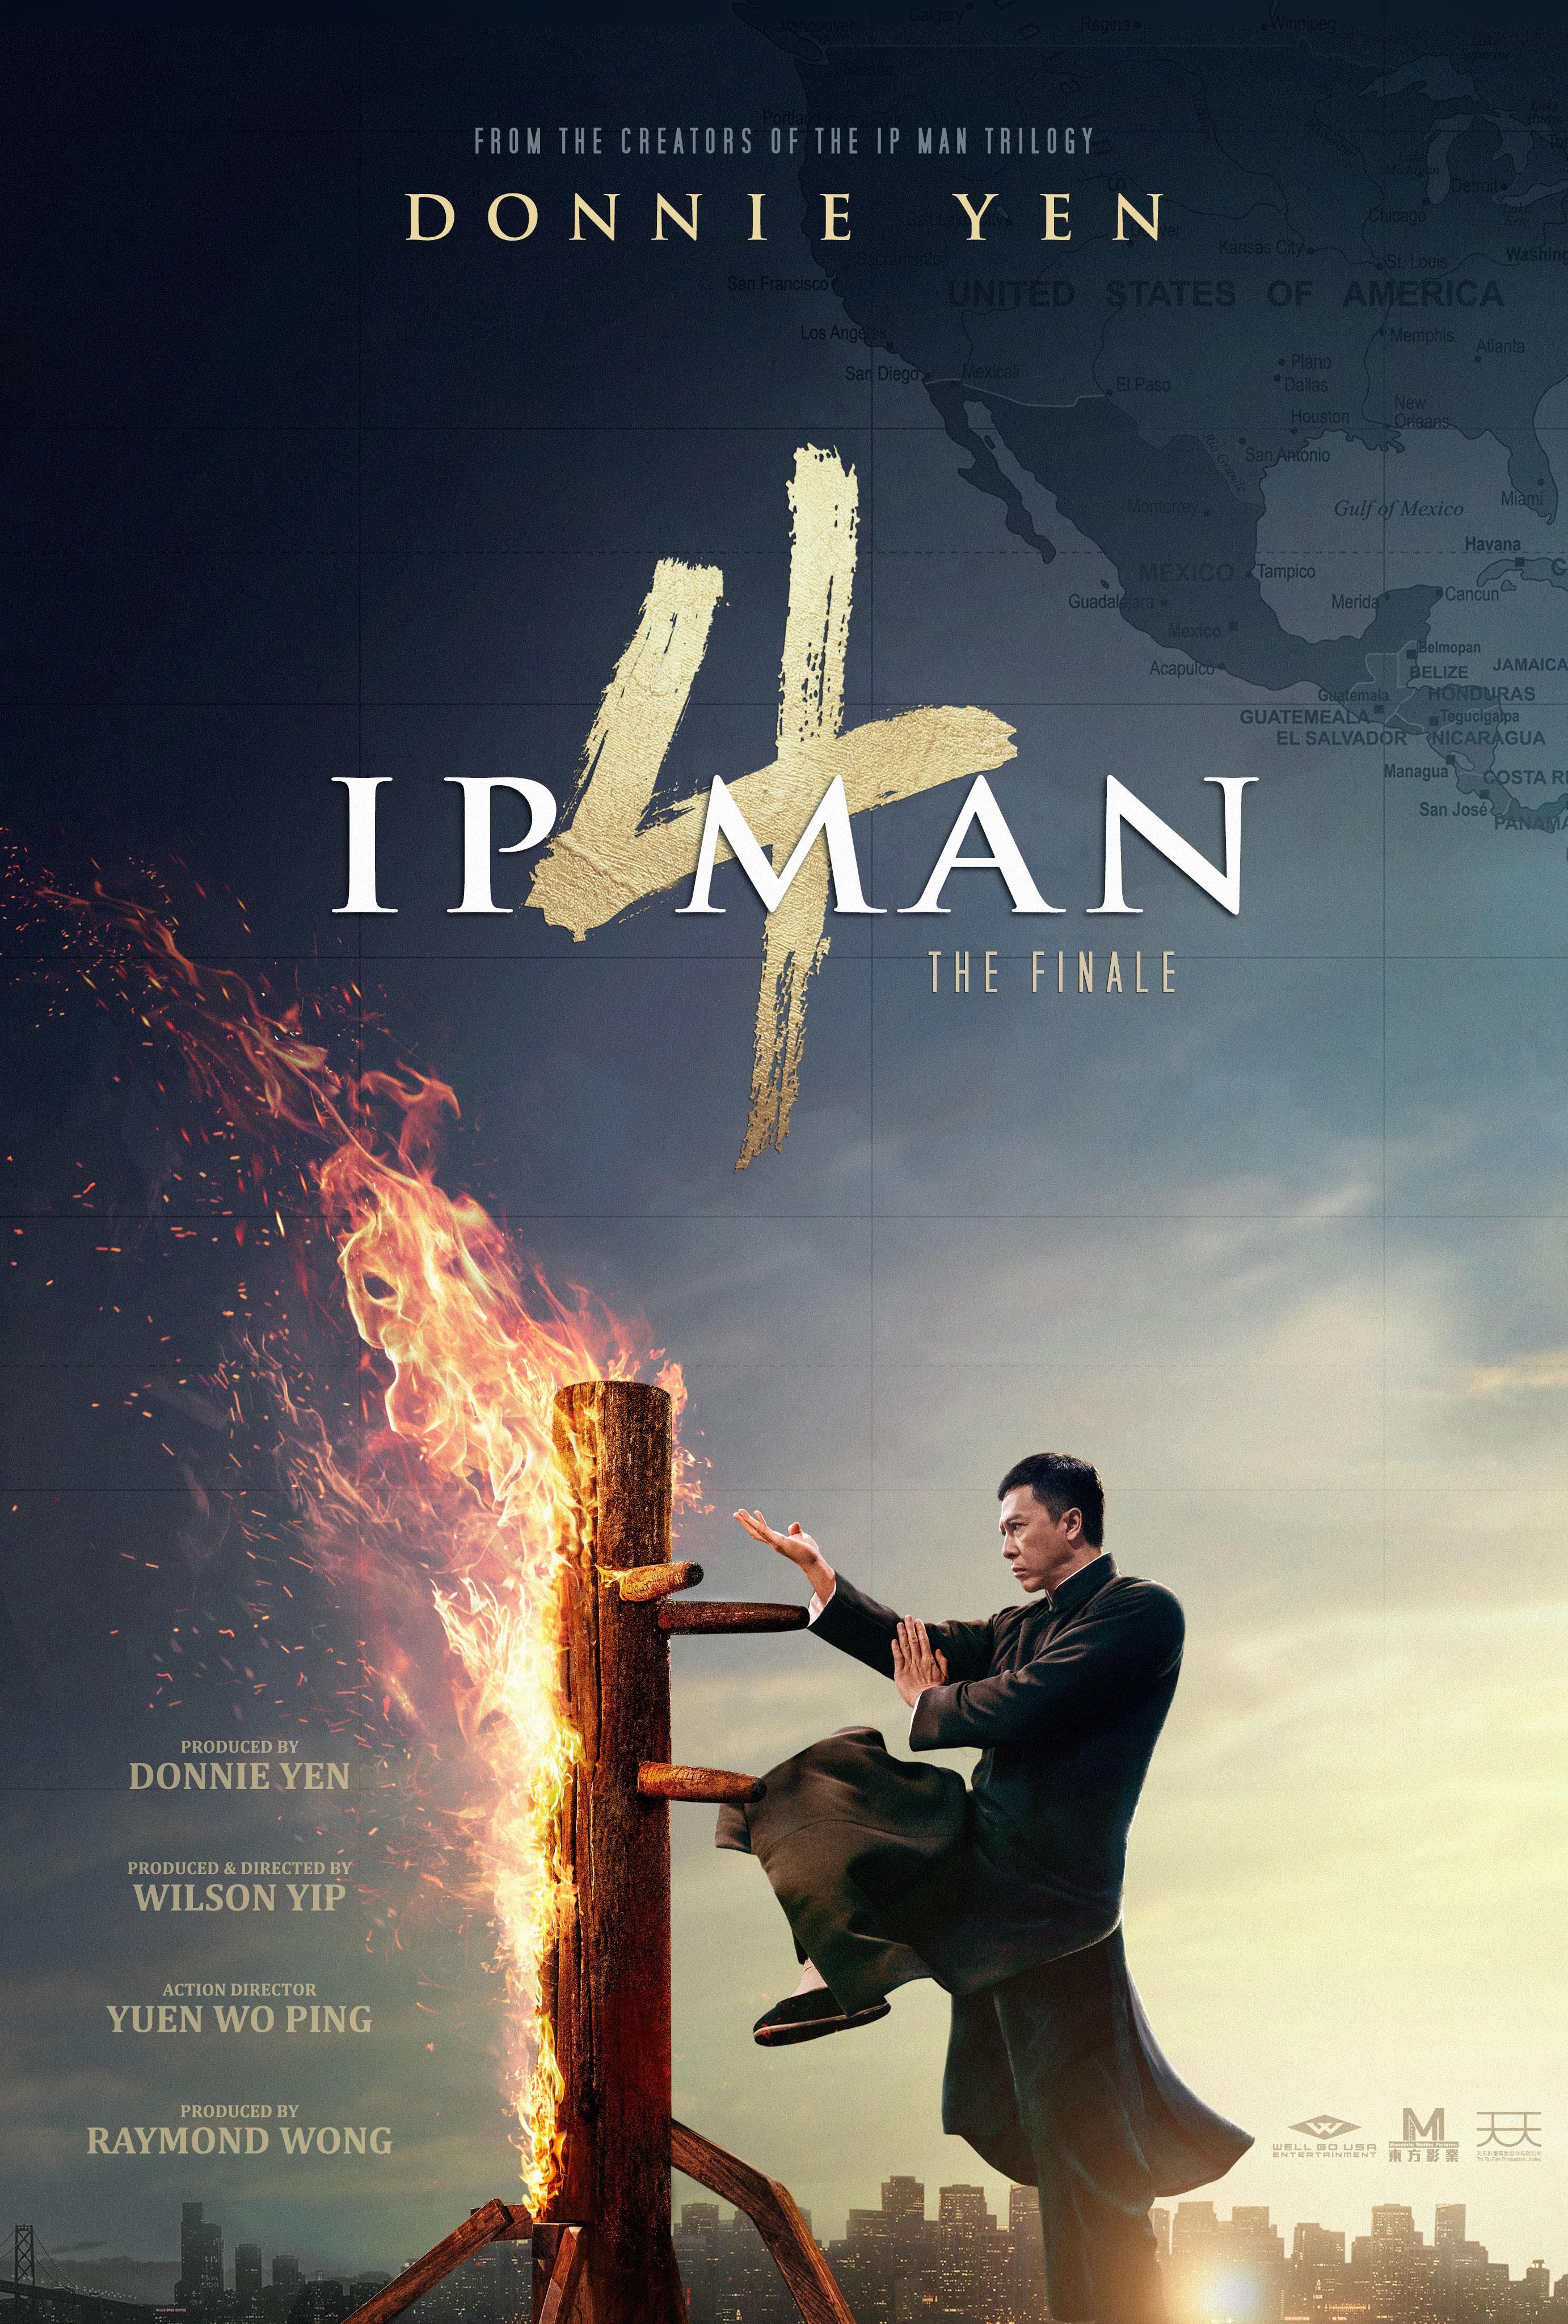 Ip.Man.4.The.Finale.2019.German.DL.1080p.BluRay.AVC-UNTAVC